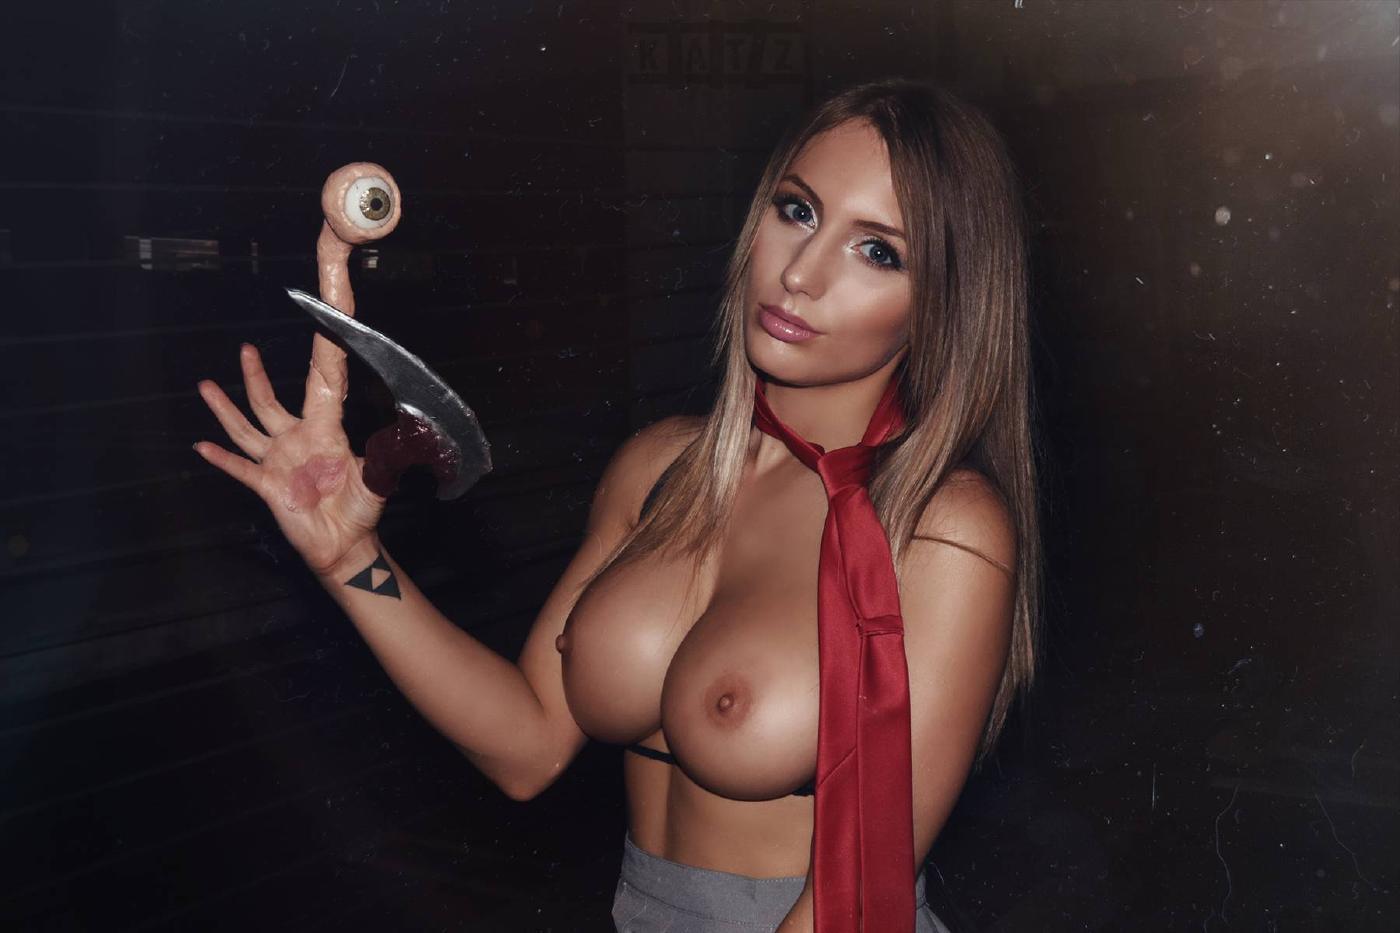 Liz Katz Harry Potter Nude Cosplay Onlyfans Set Leaked